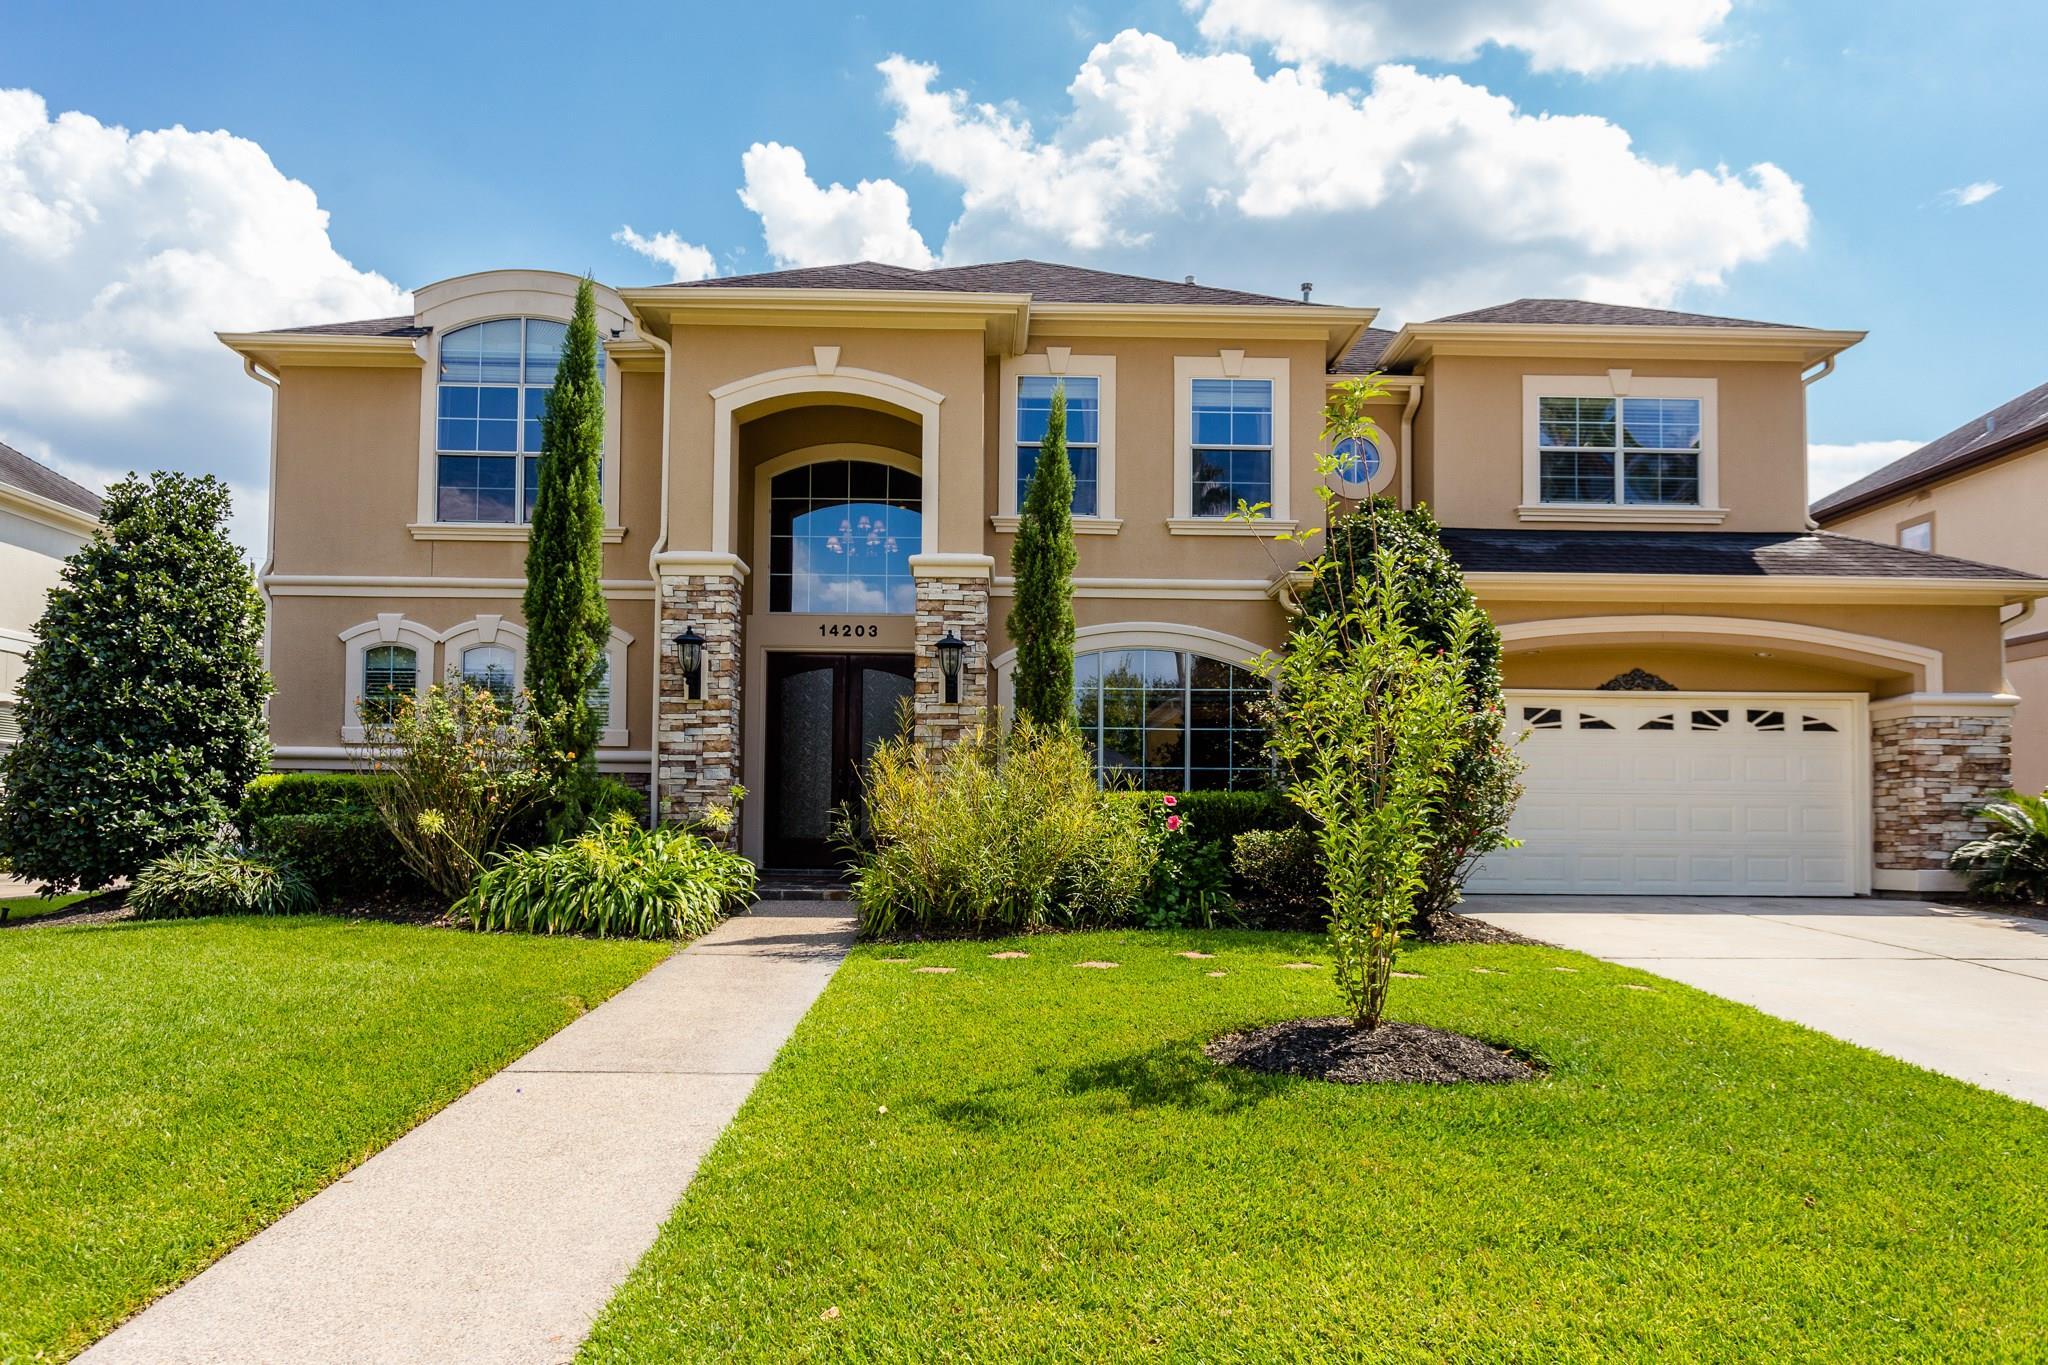 14203 Jade Cove Drive Property Photo - Houston, TX real estate listing